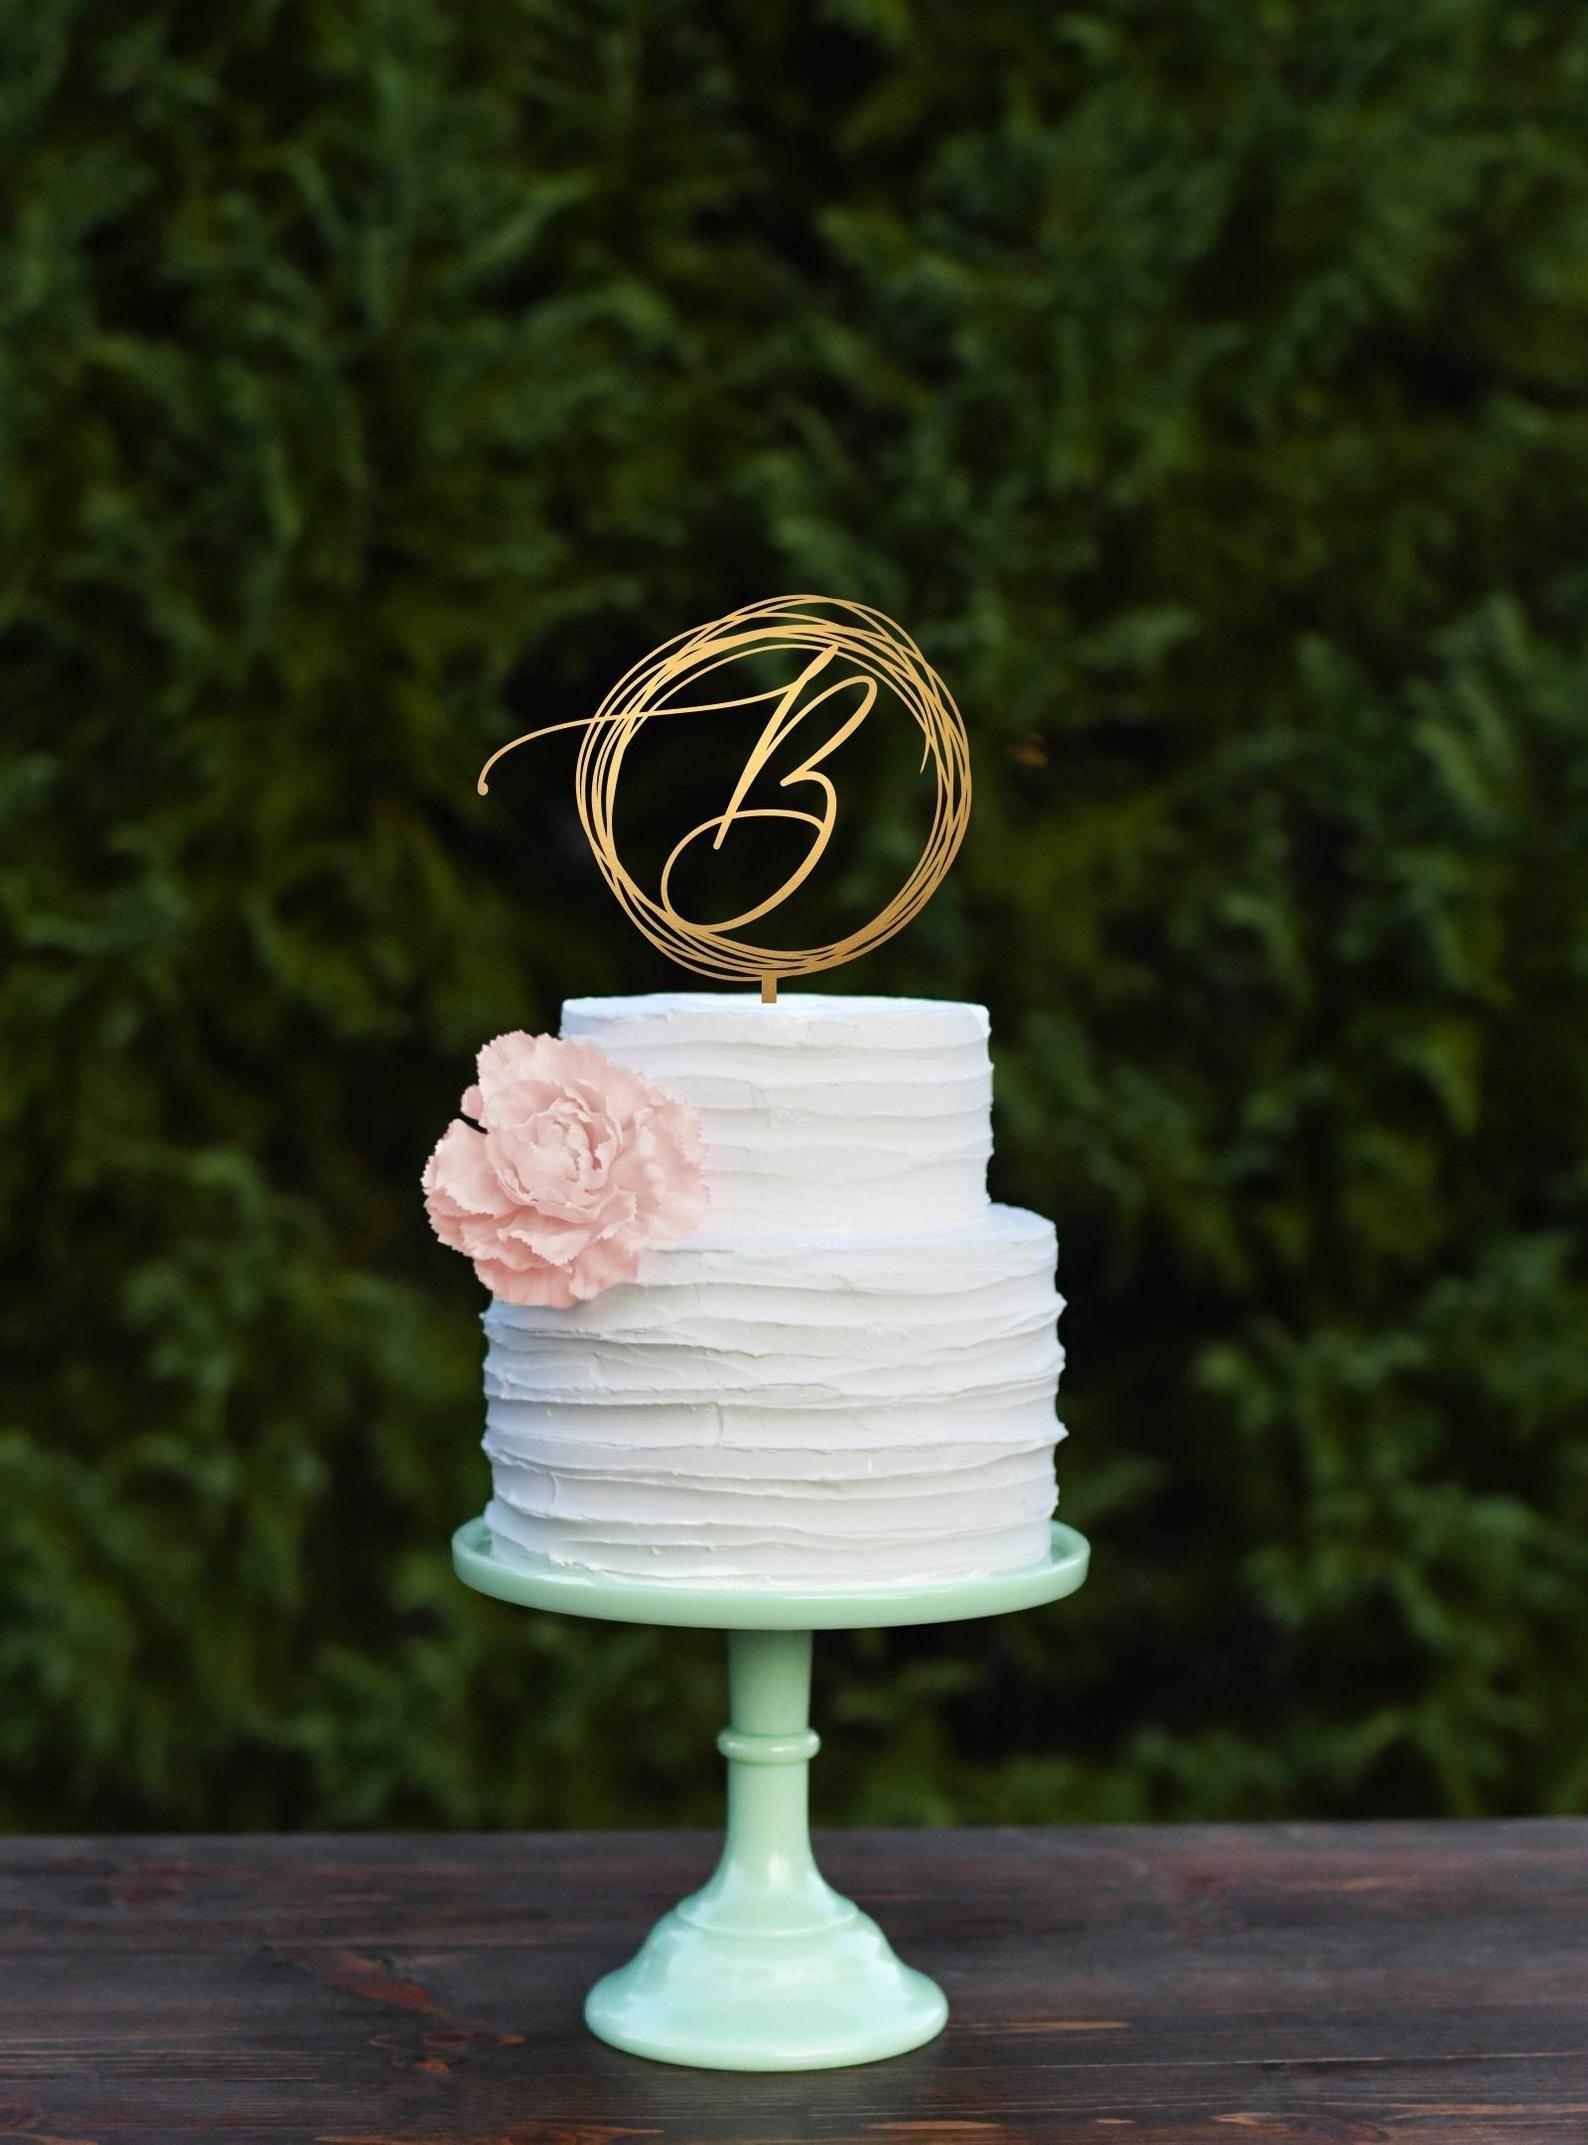 Initial Wedding Cake Topper Monogram Custom Cake Topper Personalized Letter Elegance Script Rose Gold Silver Decor